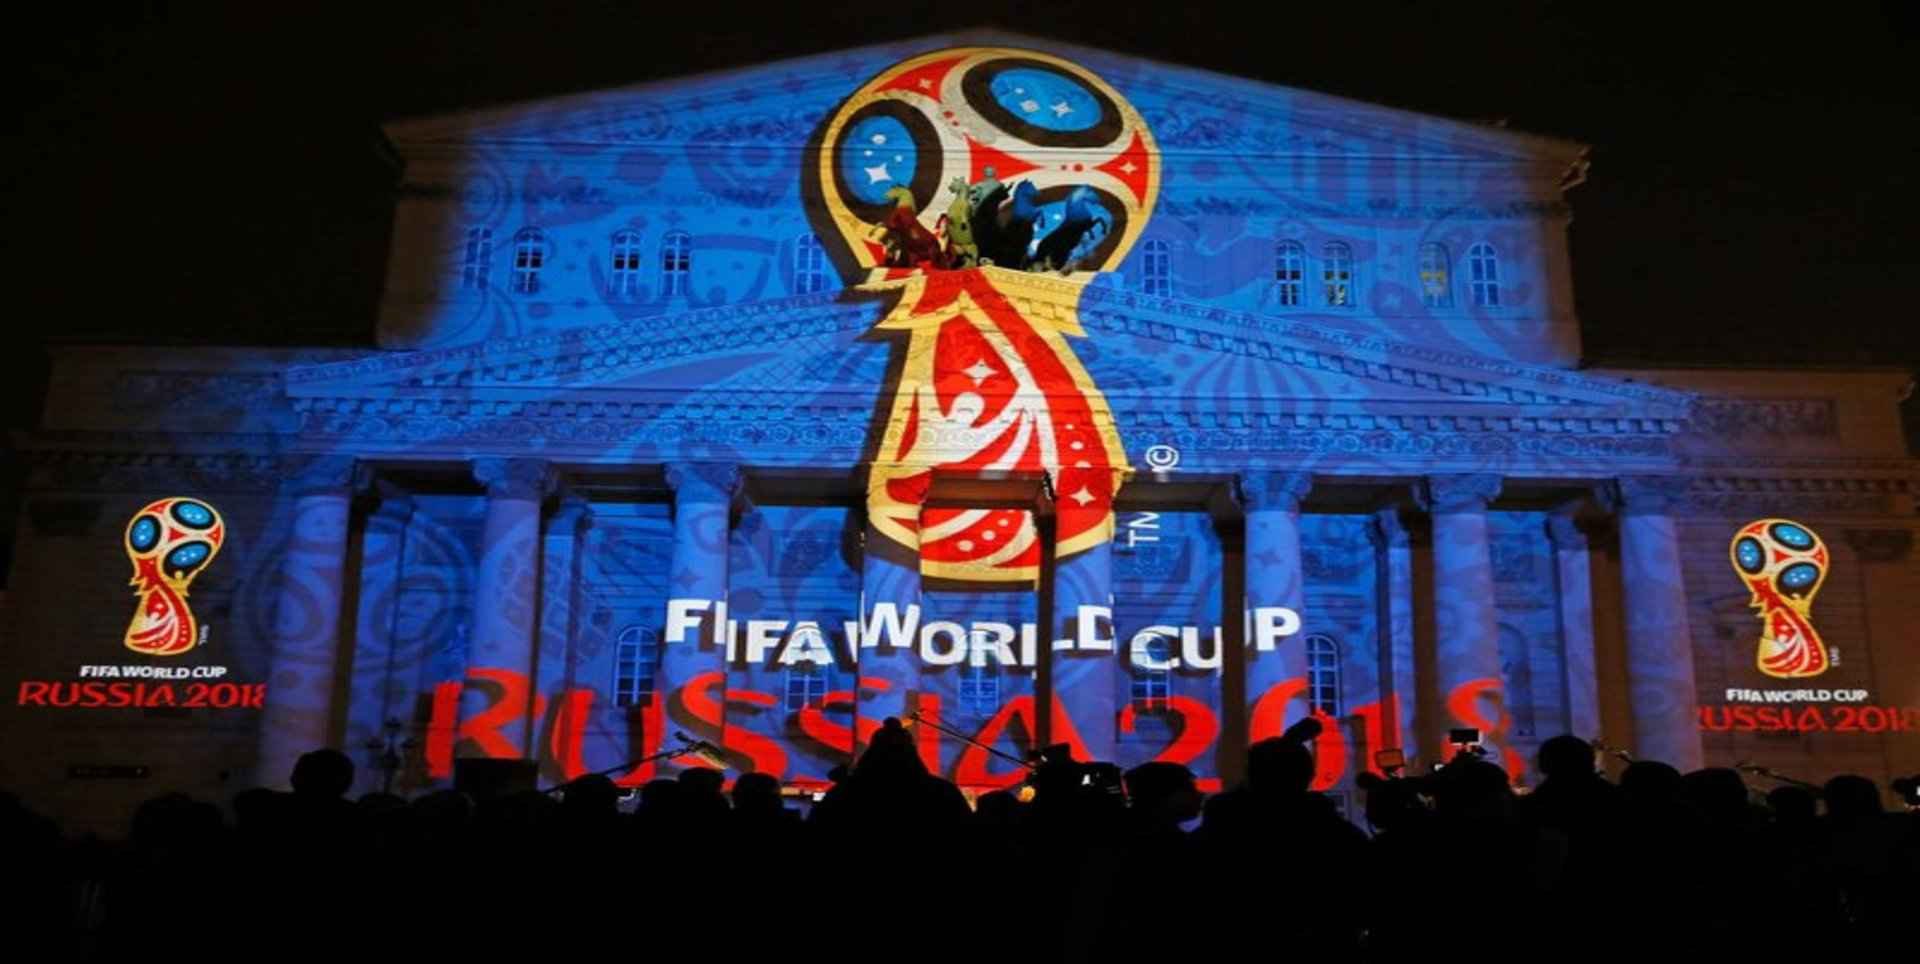 FIFA World Cup Guinea V Libya Live